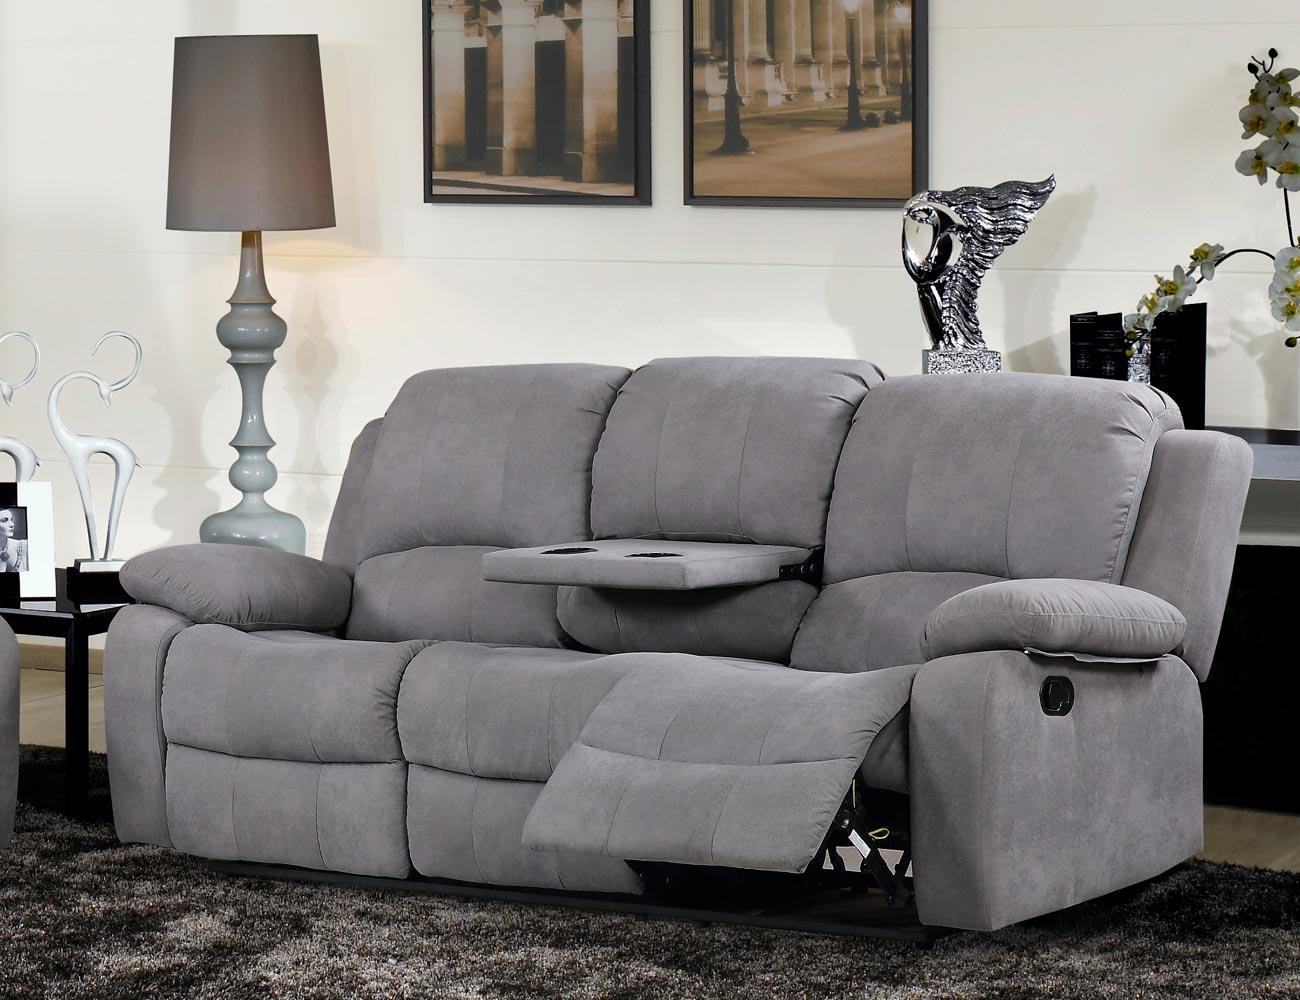 Sofa relax bandeja copas auxiliar 3 plazas